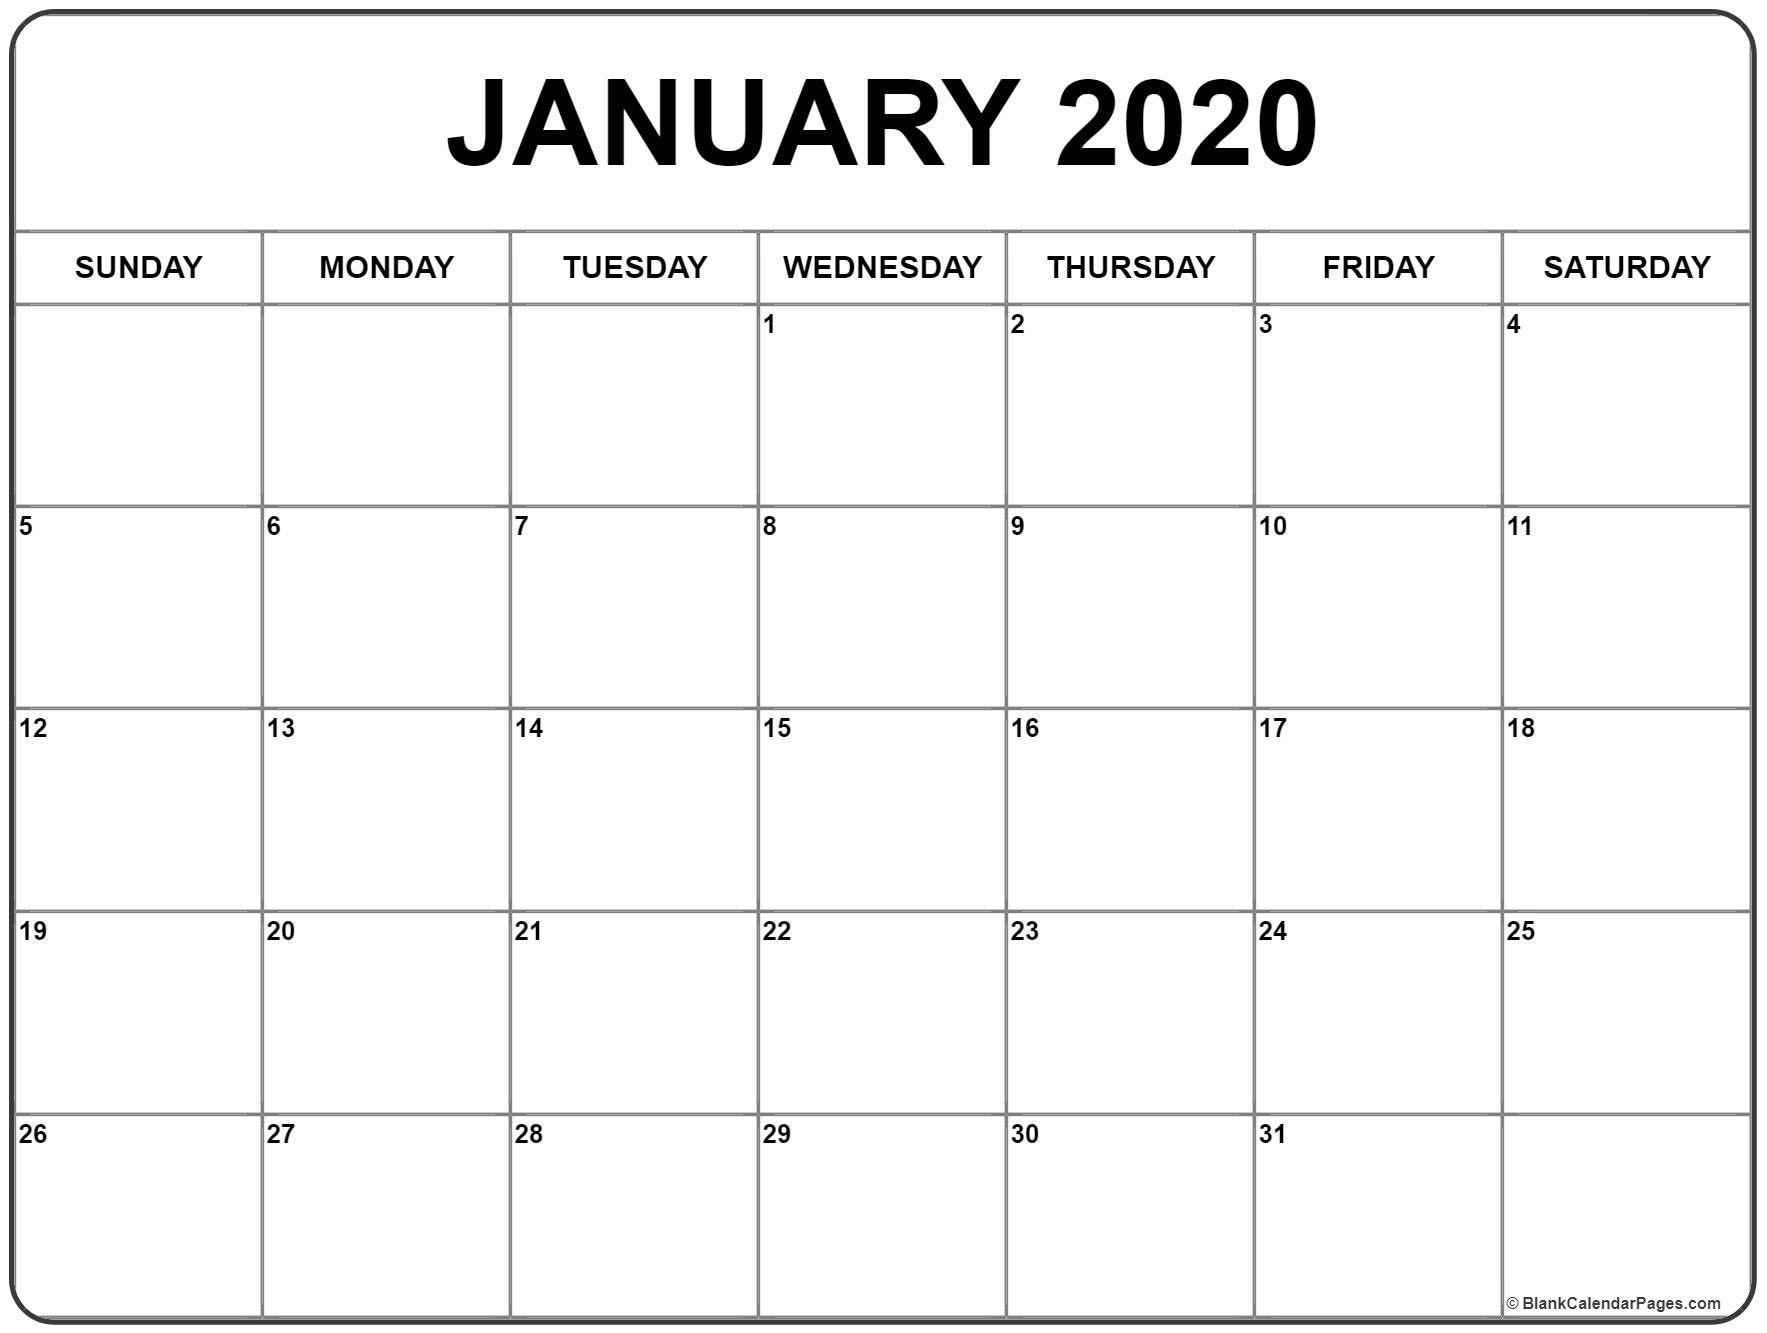 January 2020 Calendar 56 Templates Of 2020 Printable January